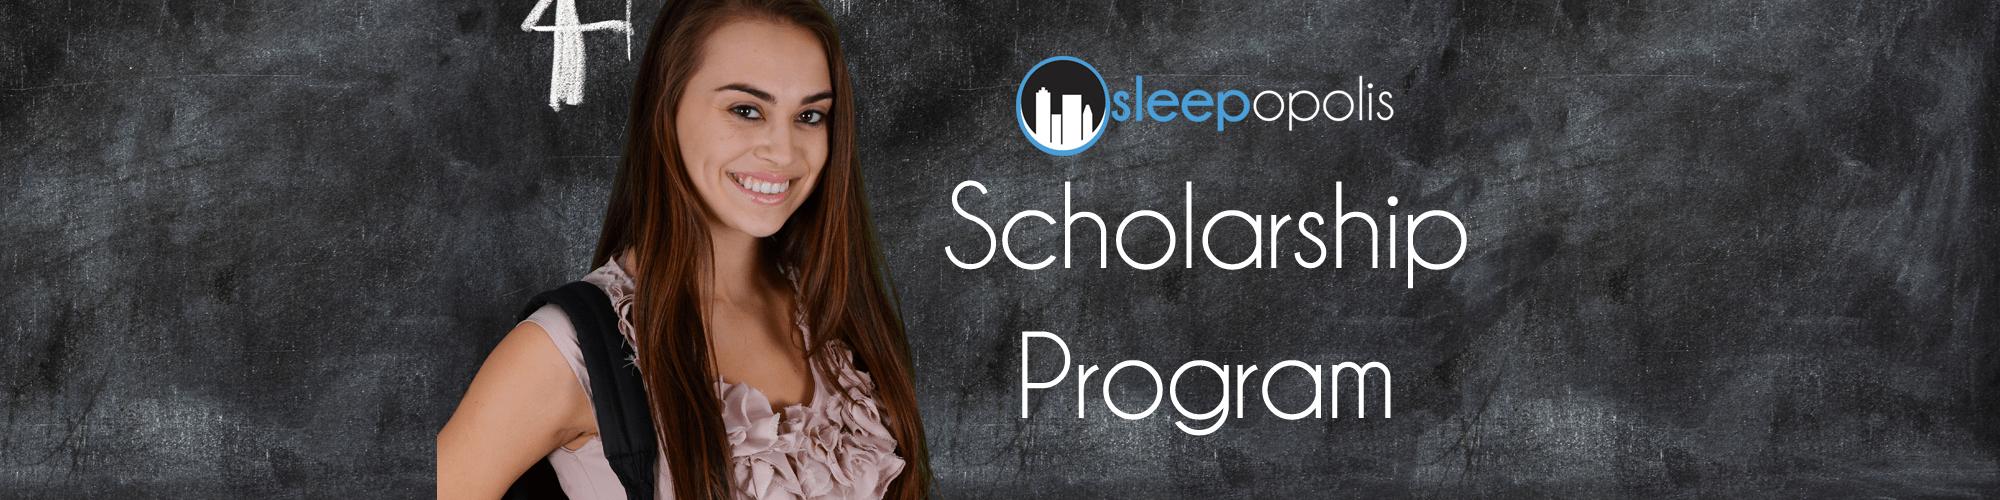 Sleepopolis Scholarship Program